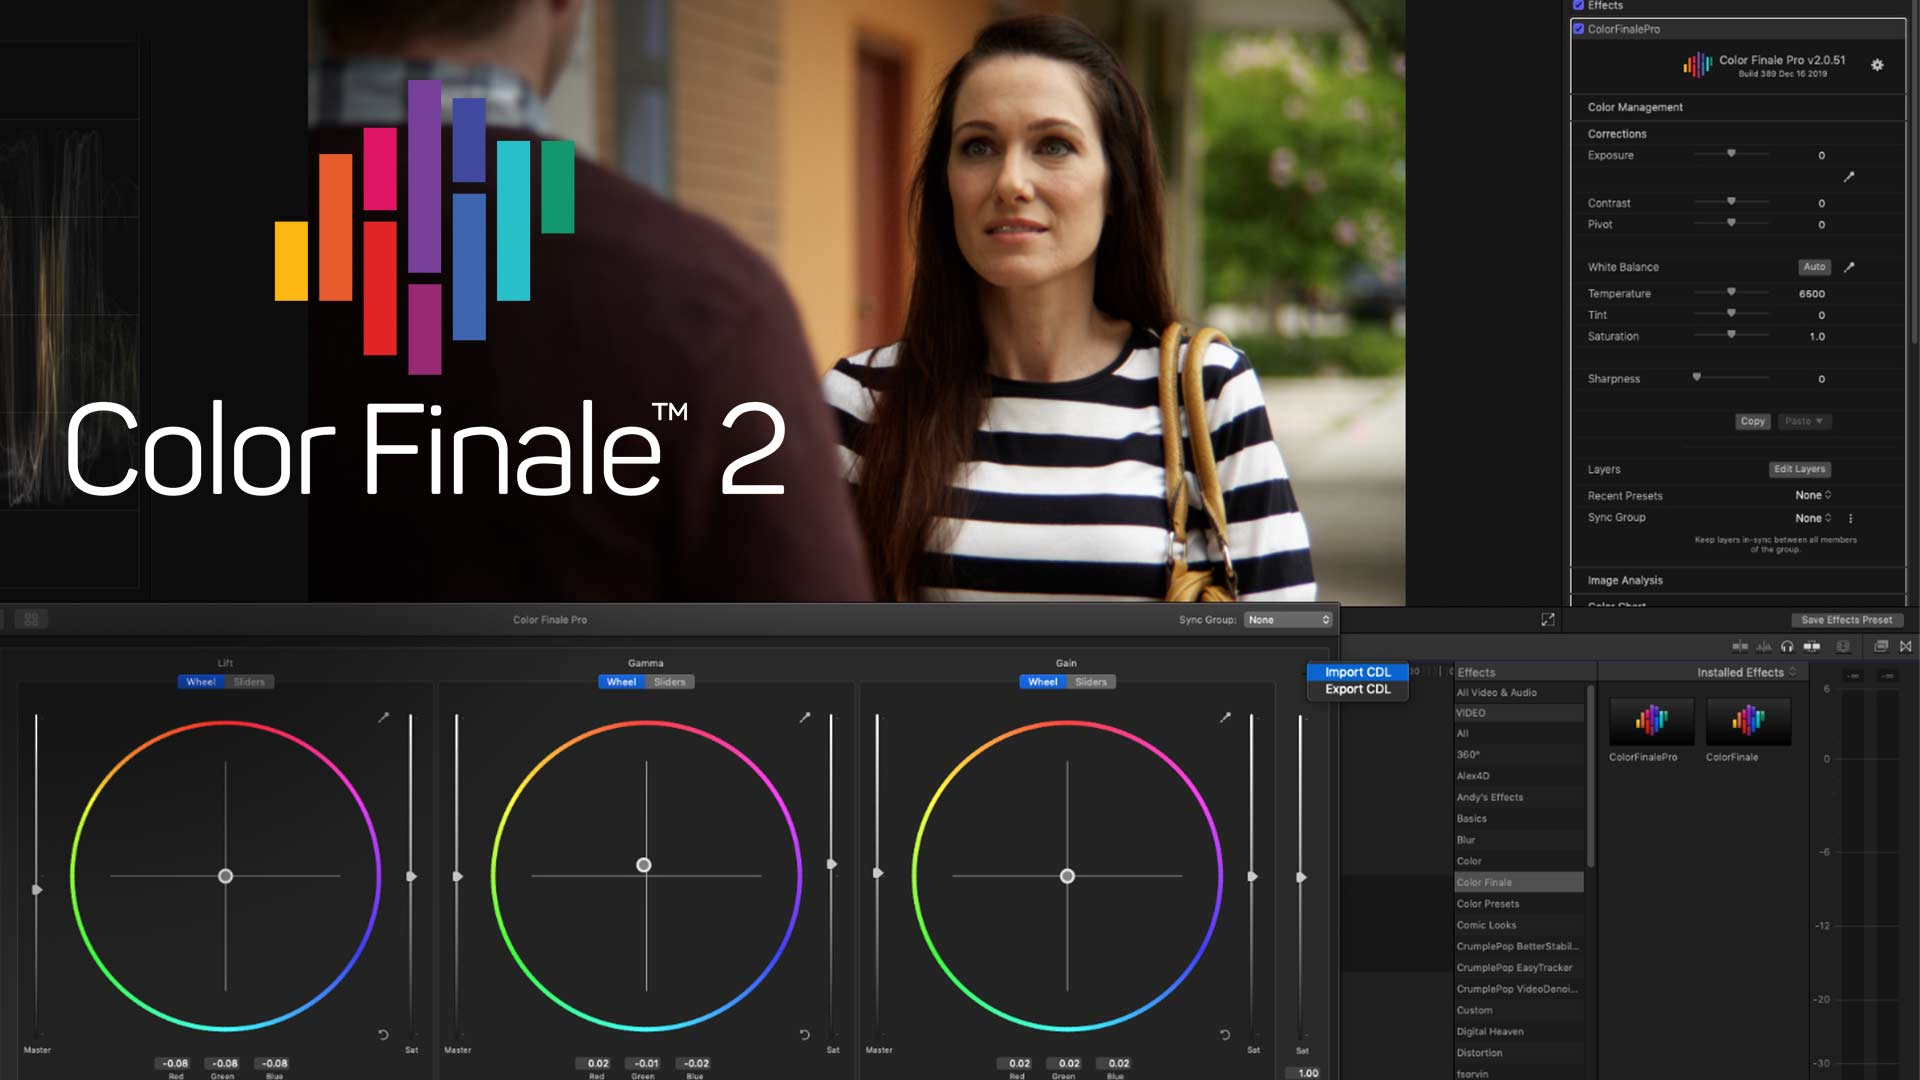 Advanced Colour Grading in Final Cut Pro X With Color Finale 2